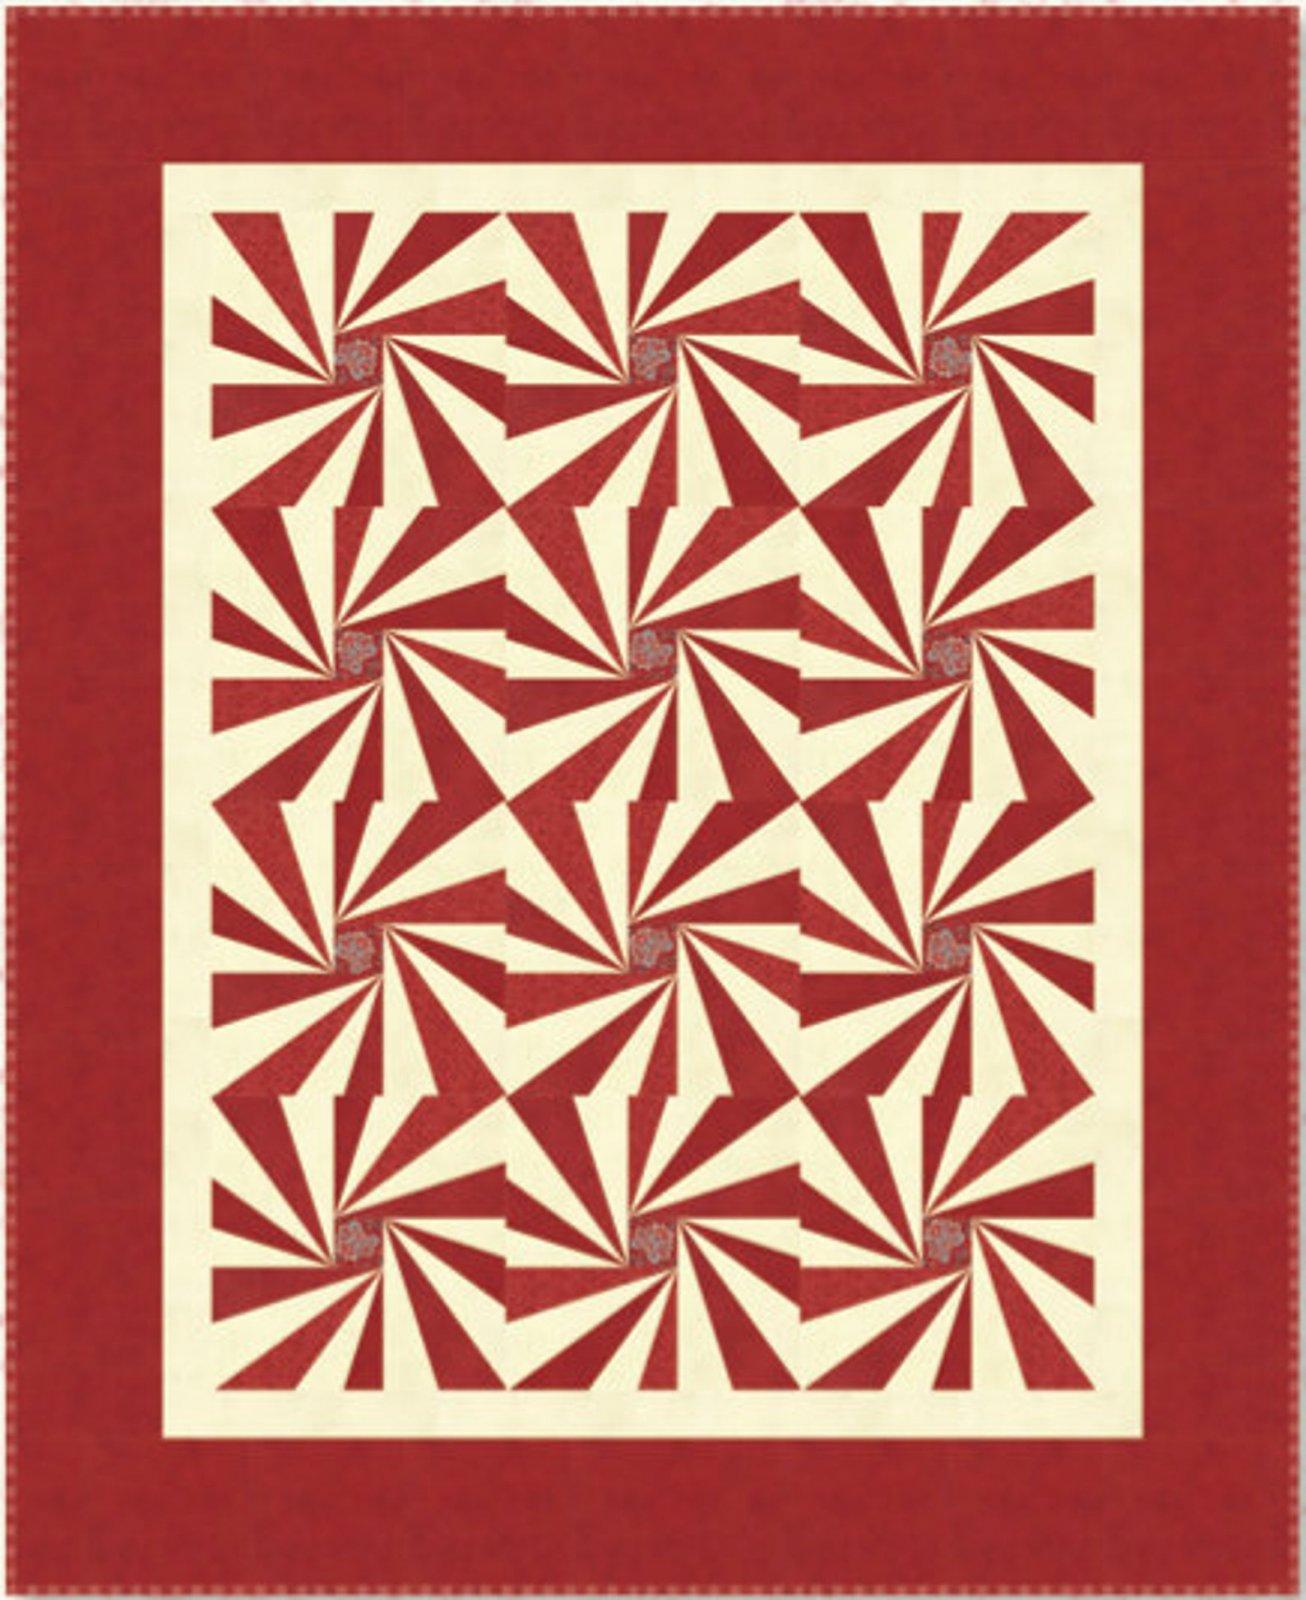 Starburst Pattern by Minick & Simpson